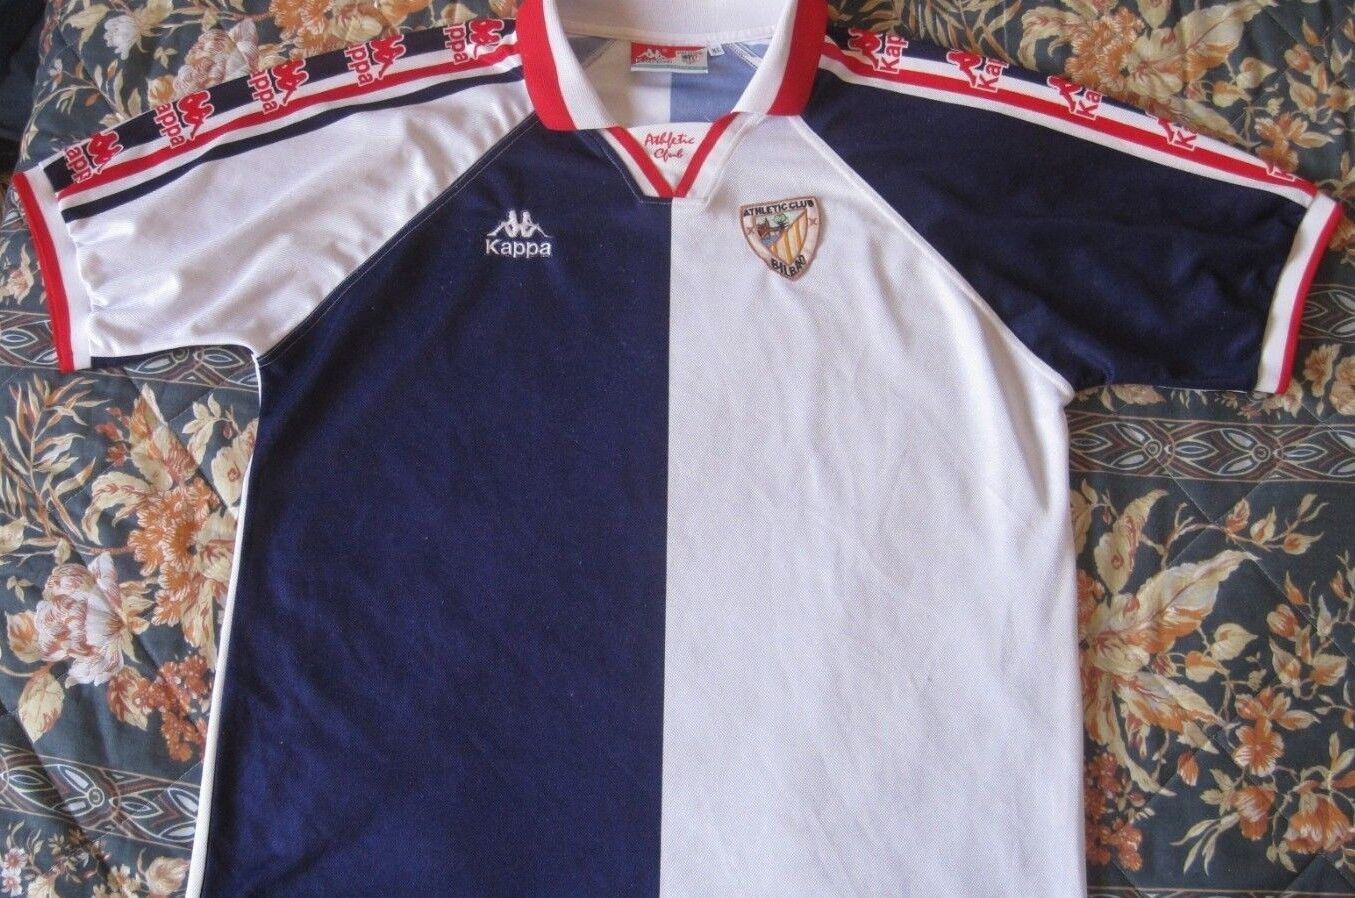 Camiseta Shirt  Maglia Maillot Trikot Athletic Bilbao Kappa Season 1997 Vintage  el mejor servicio post-venta